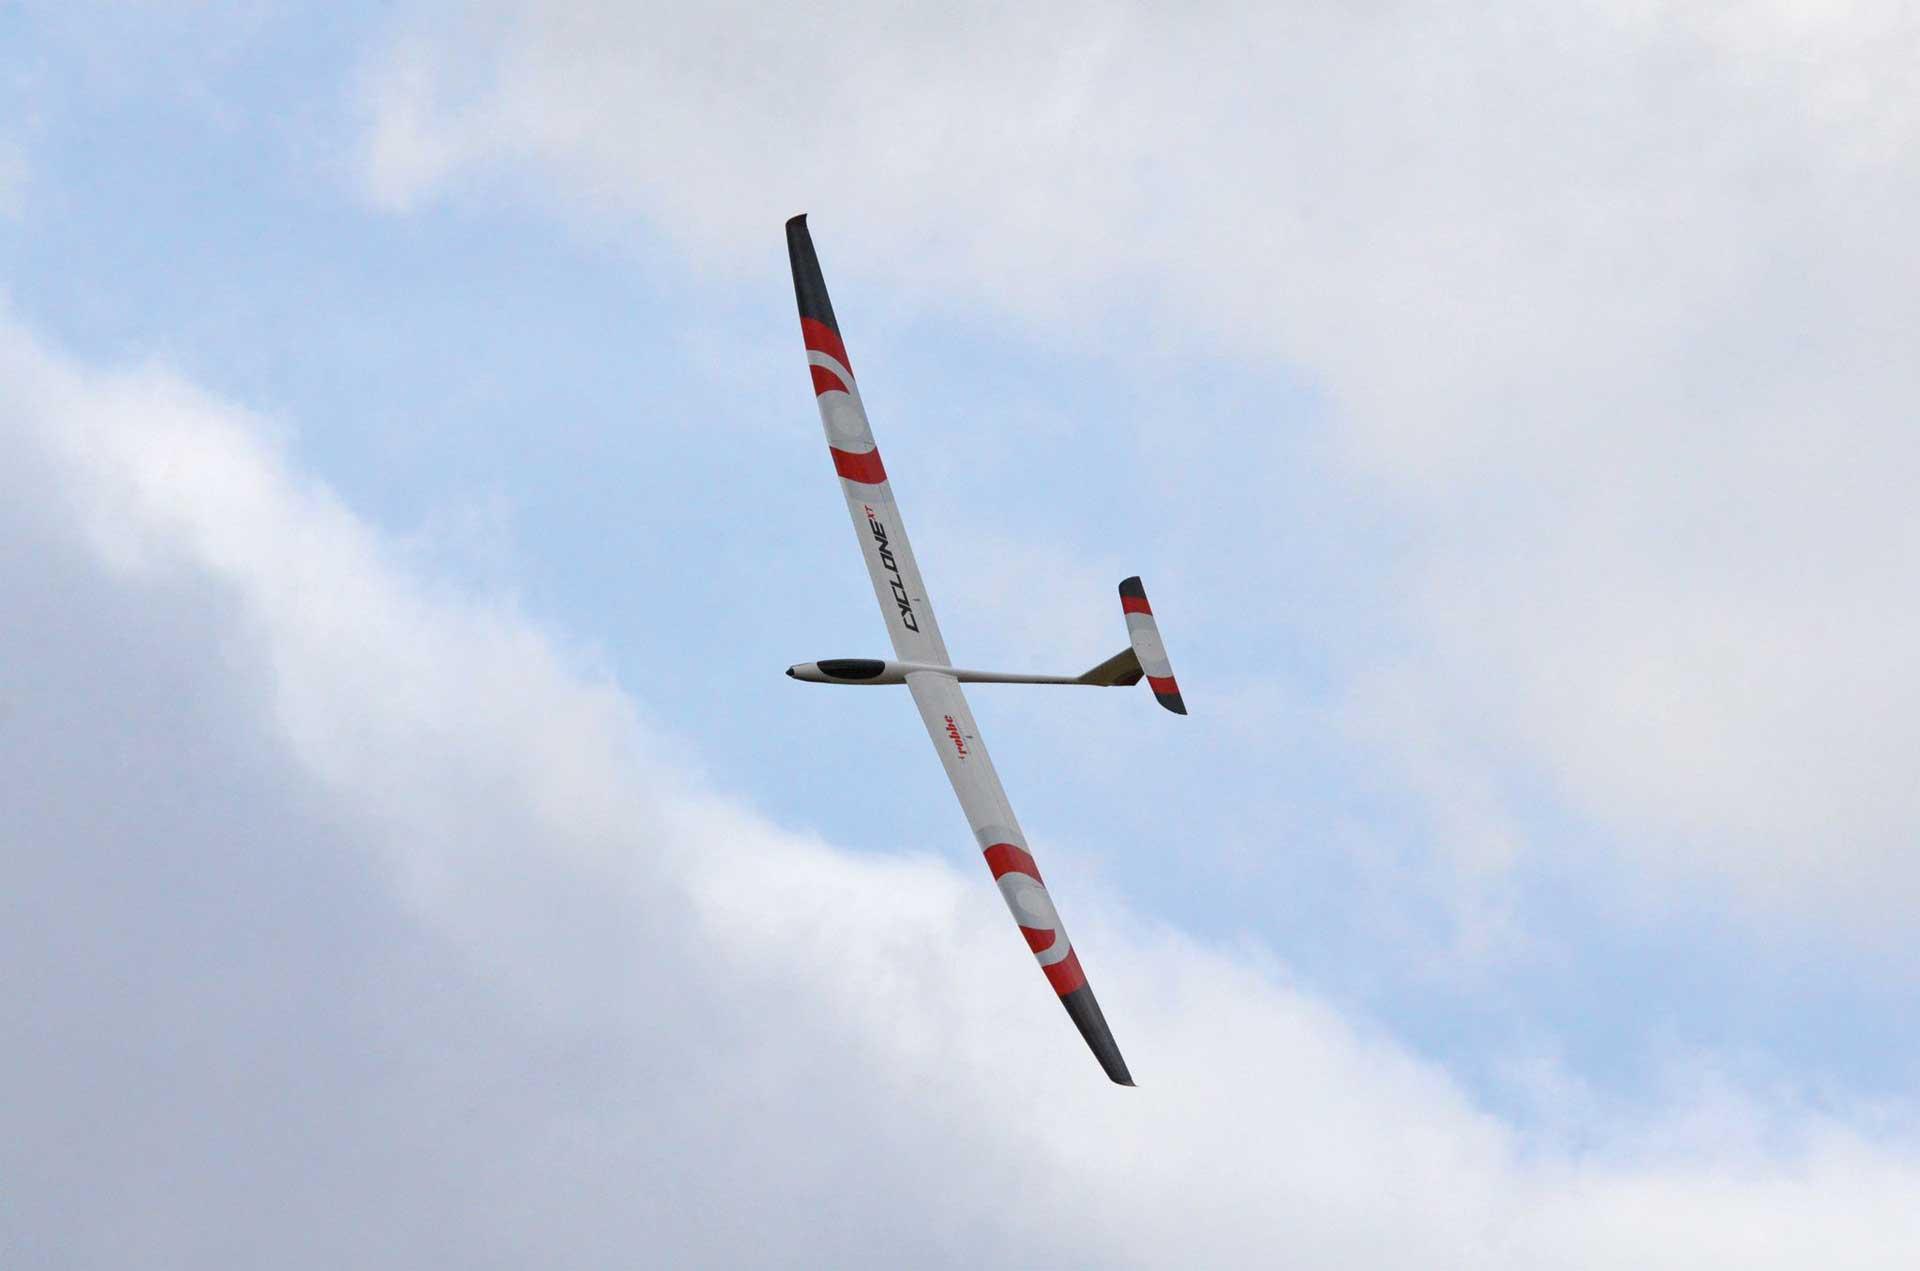 Robbe Modellsport Cyclone XT 6,2m PNP mit GfK Rumpf, 4-tlg Tragflächen mit Abachi-Beplankung